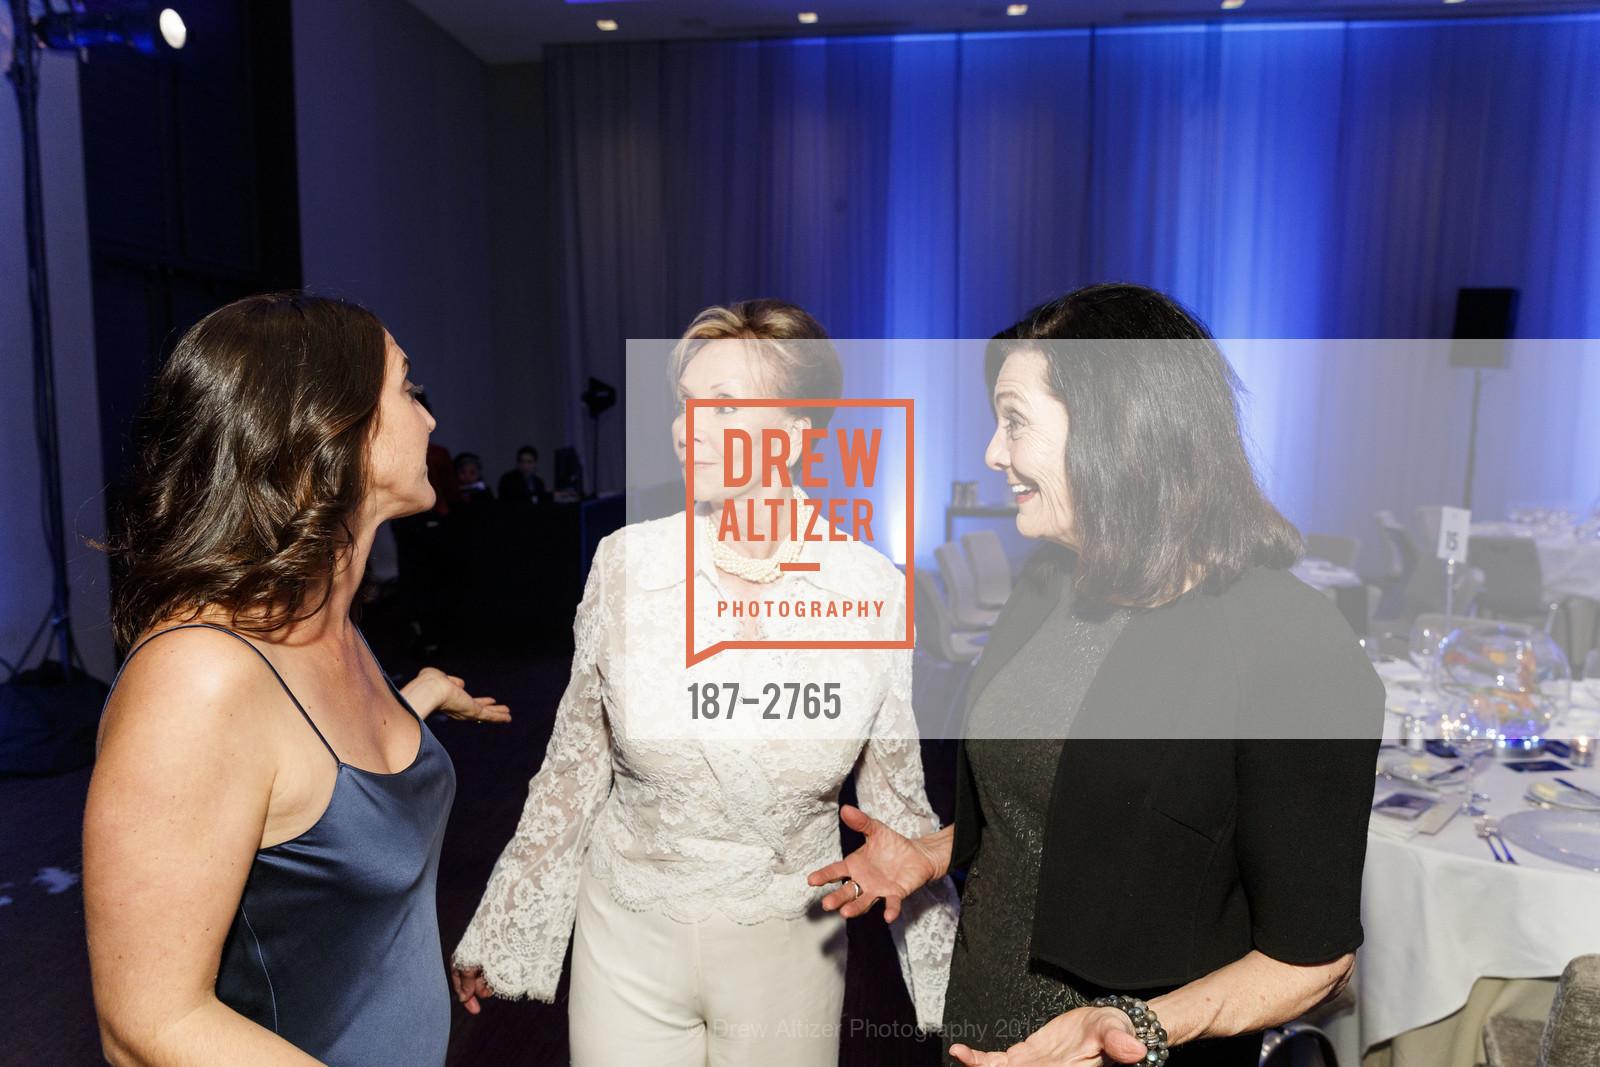 Katherine Priore Ghannan, Sallie Huntting, Pamela Culp, Photo #187-2765